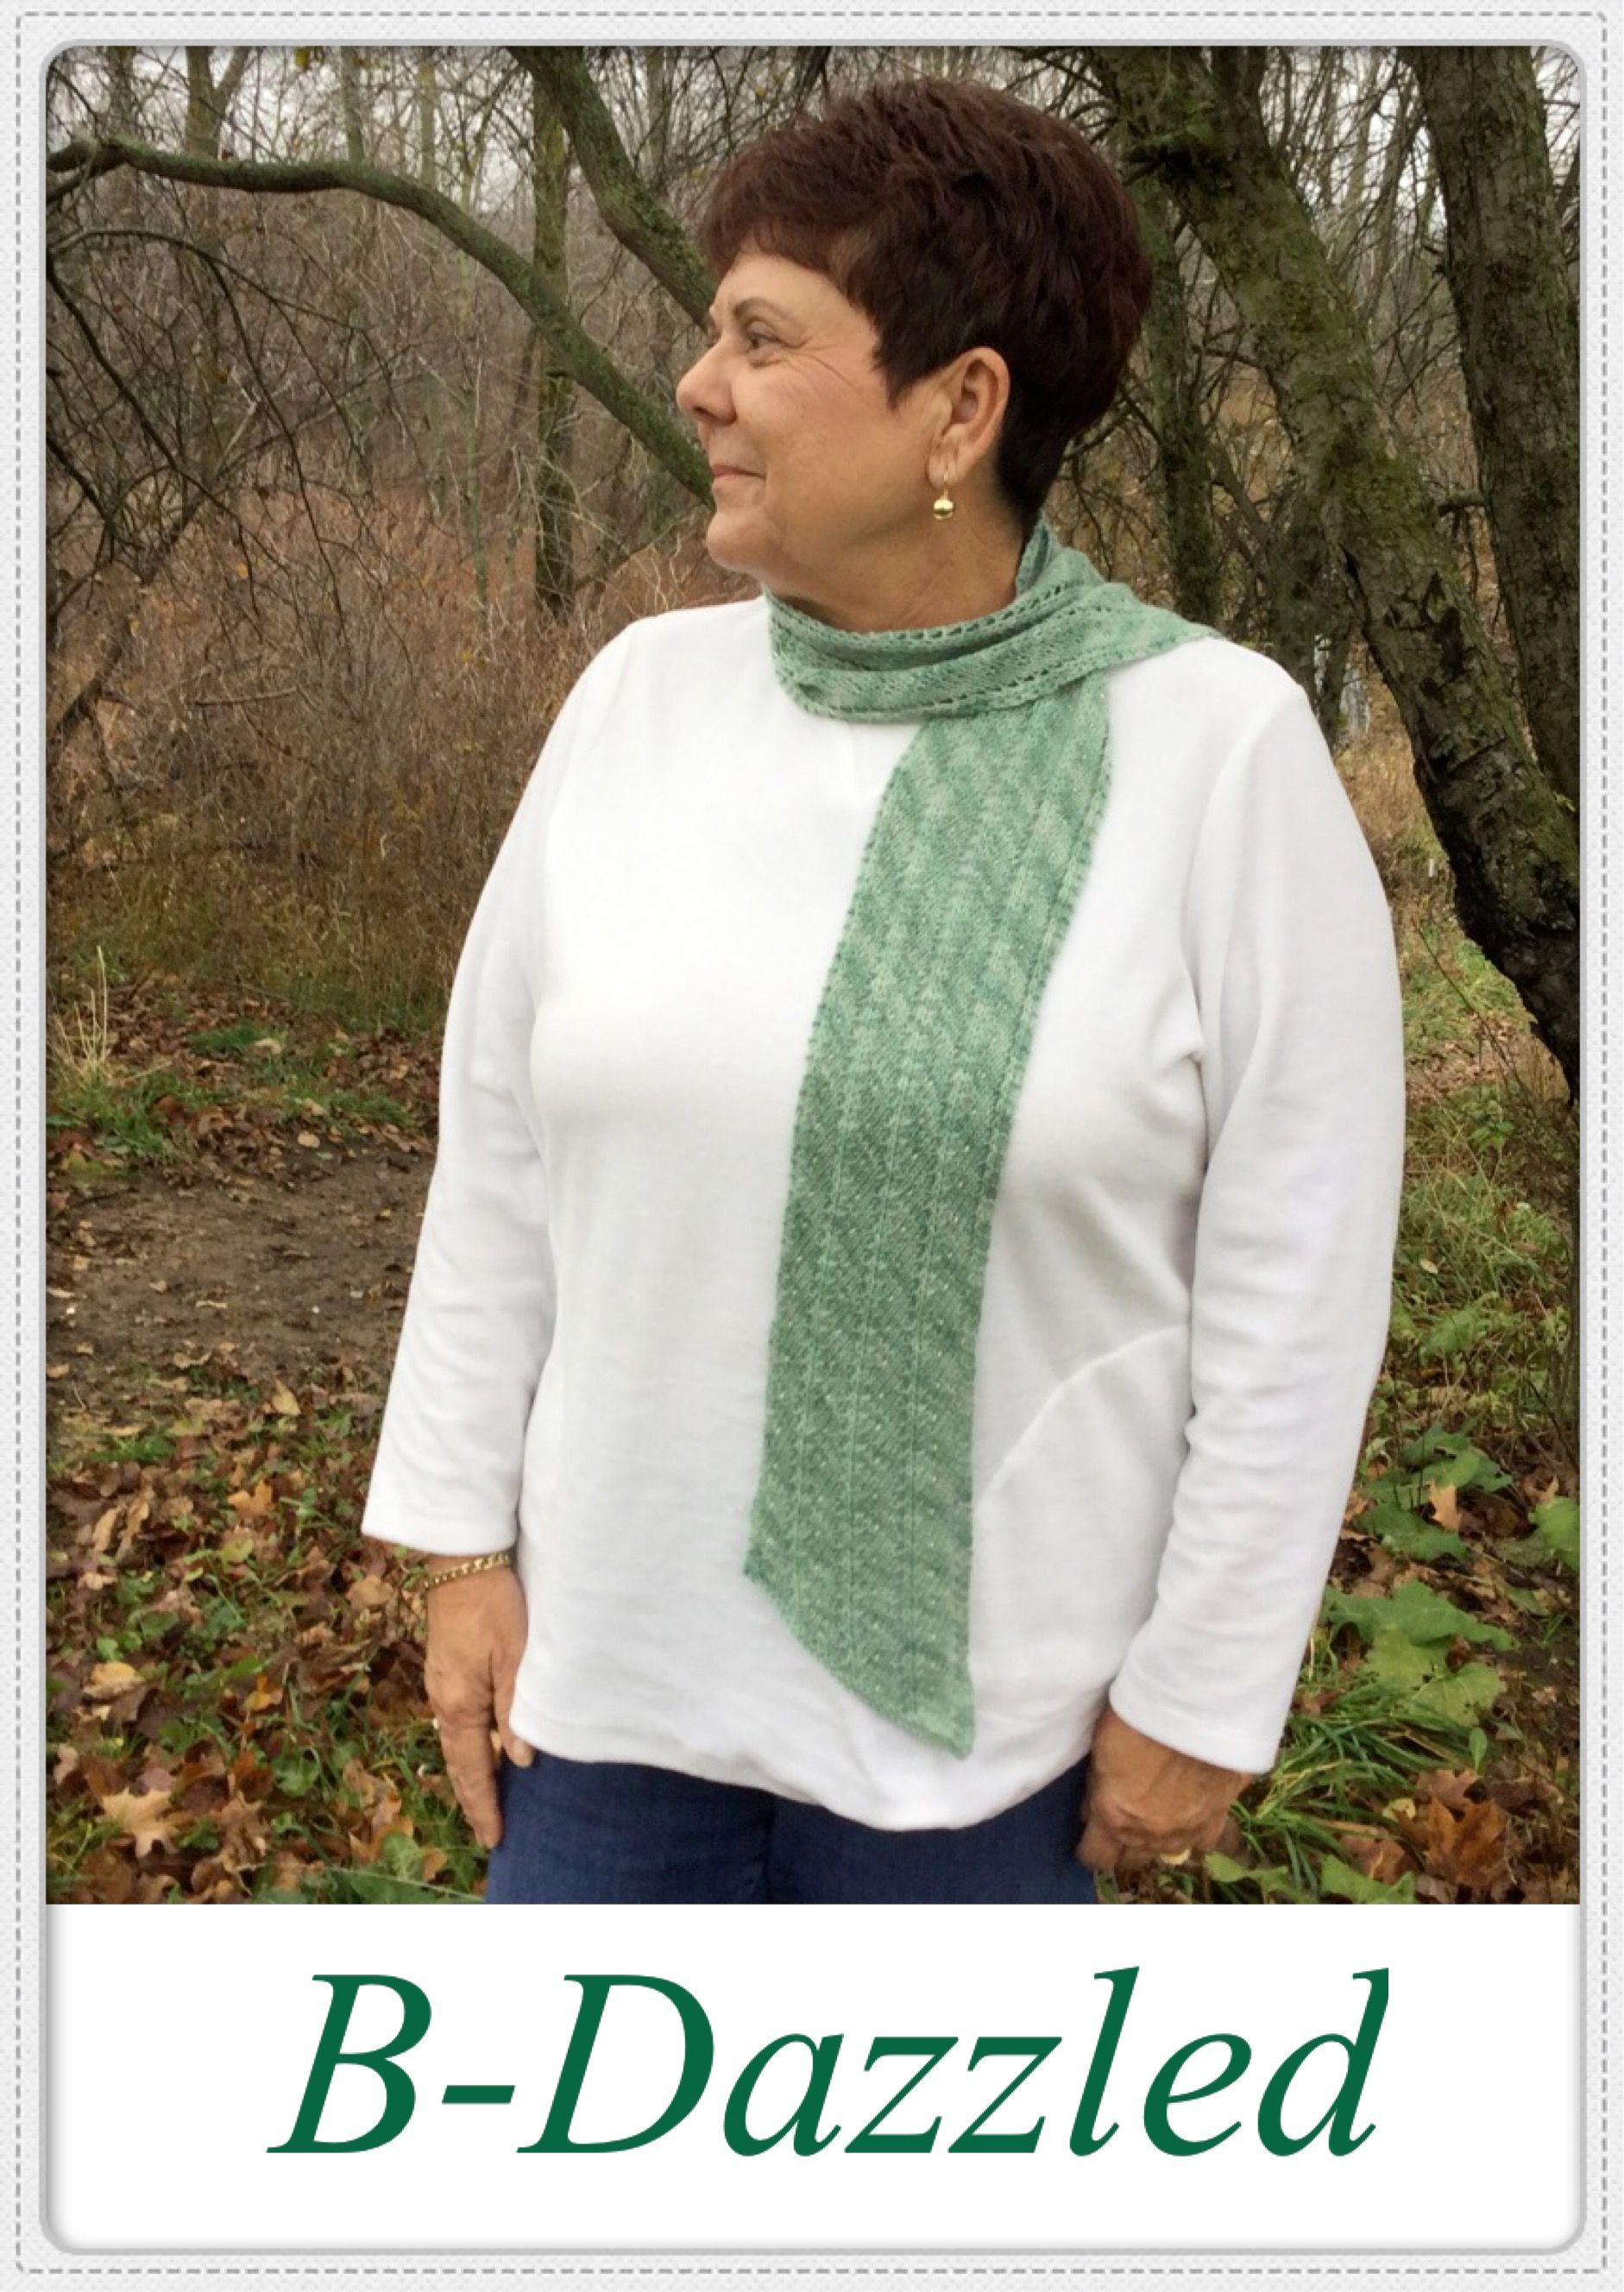 B-Dazzled pattern by Faith Schmidt